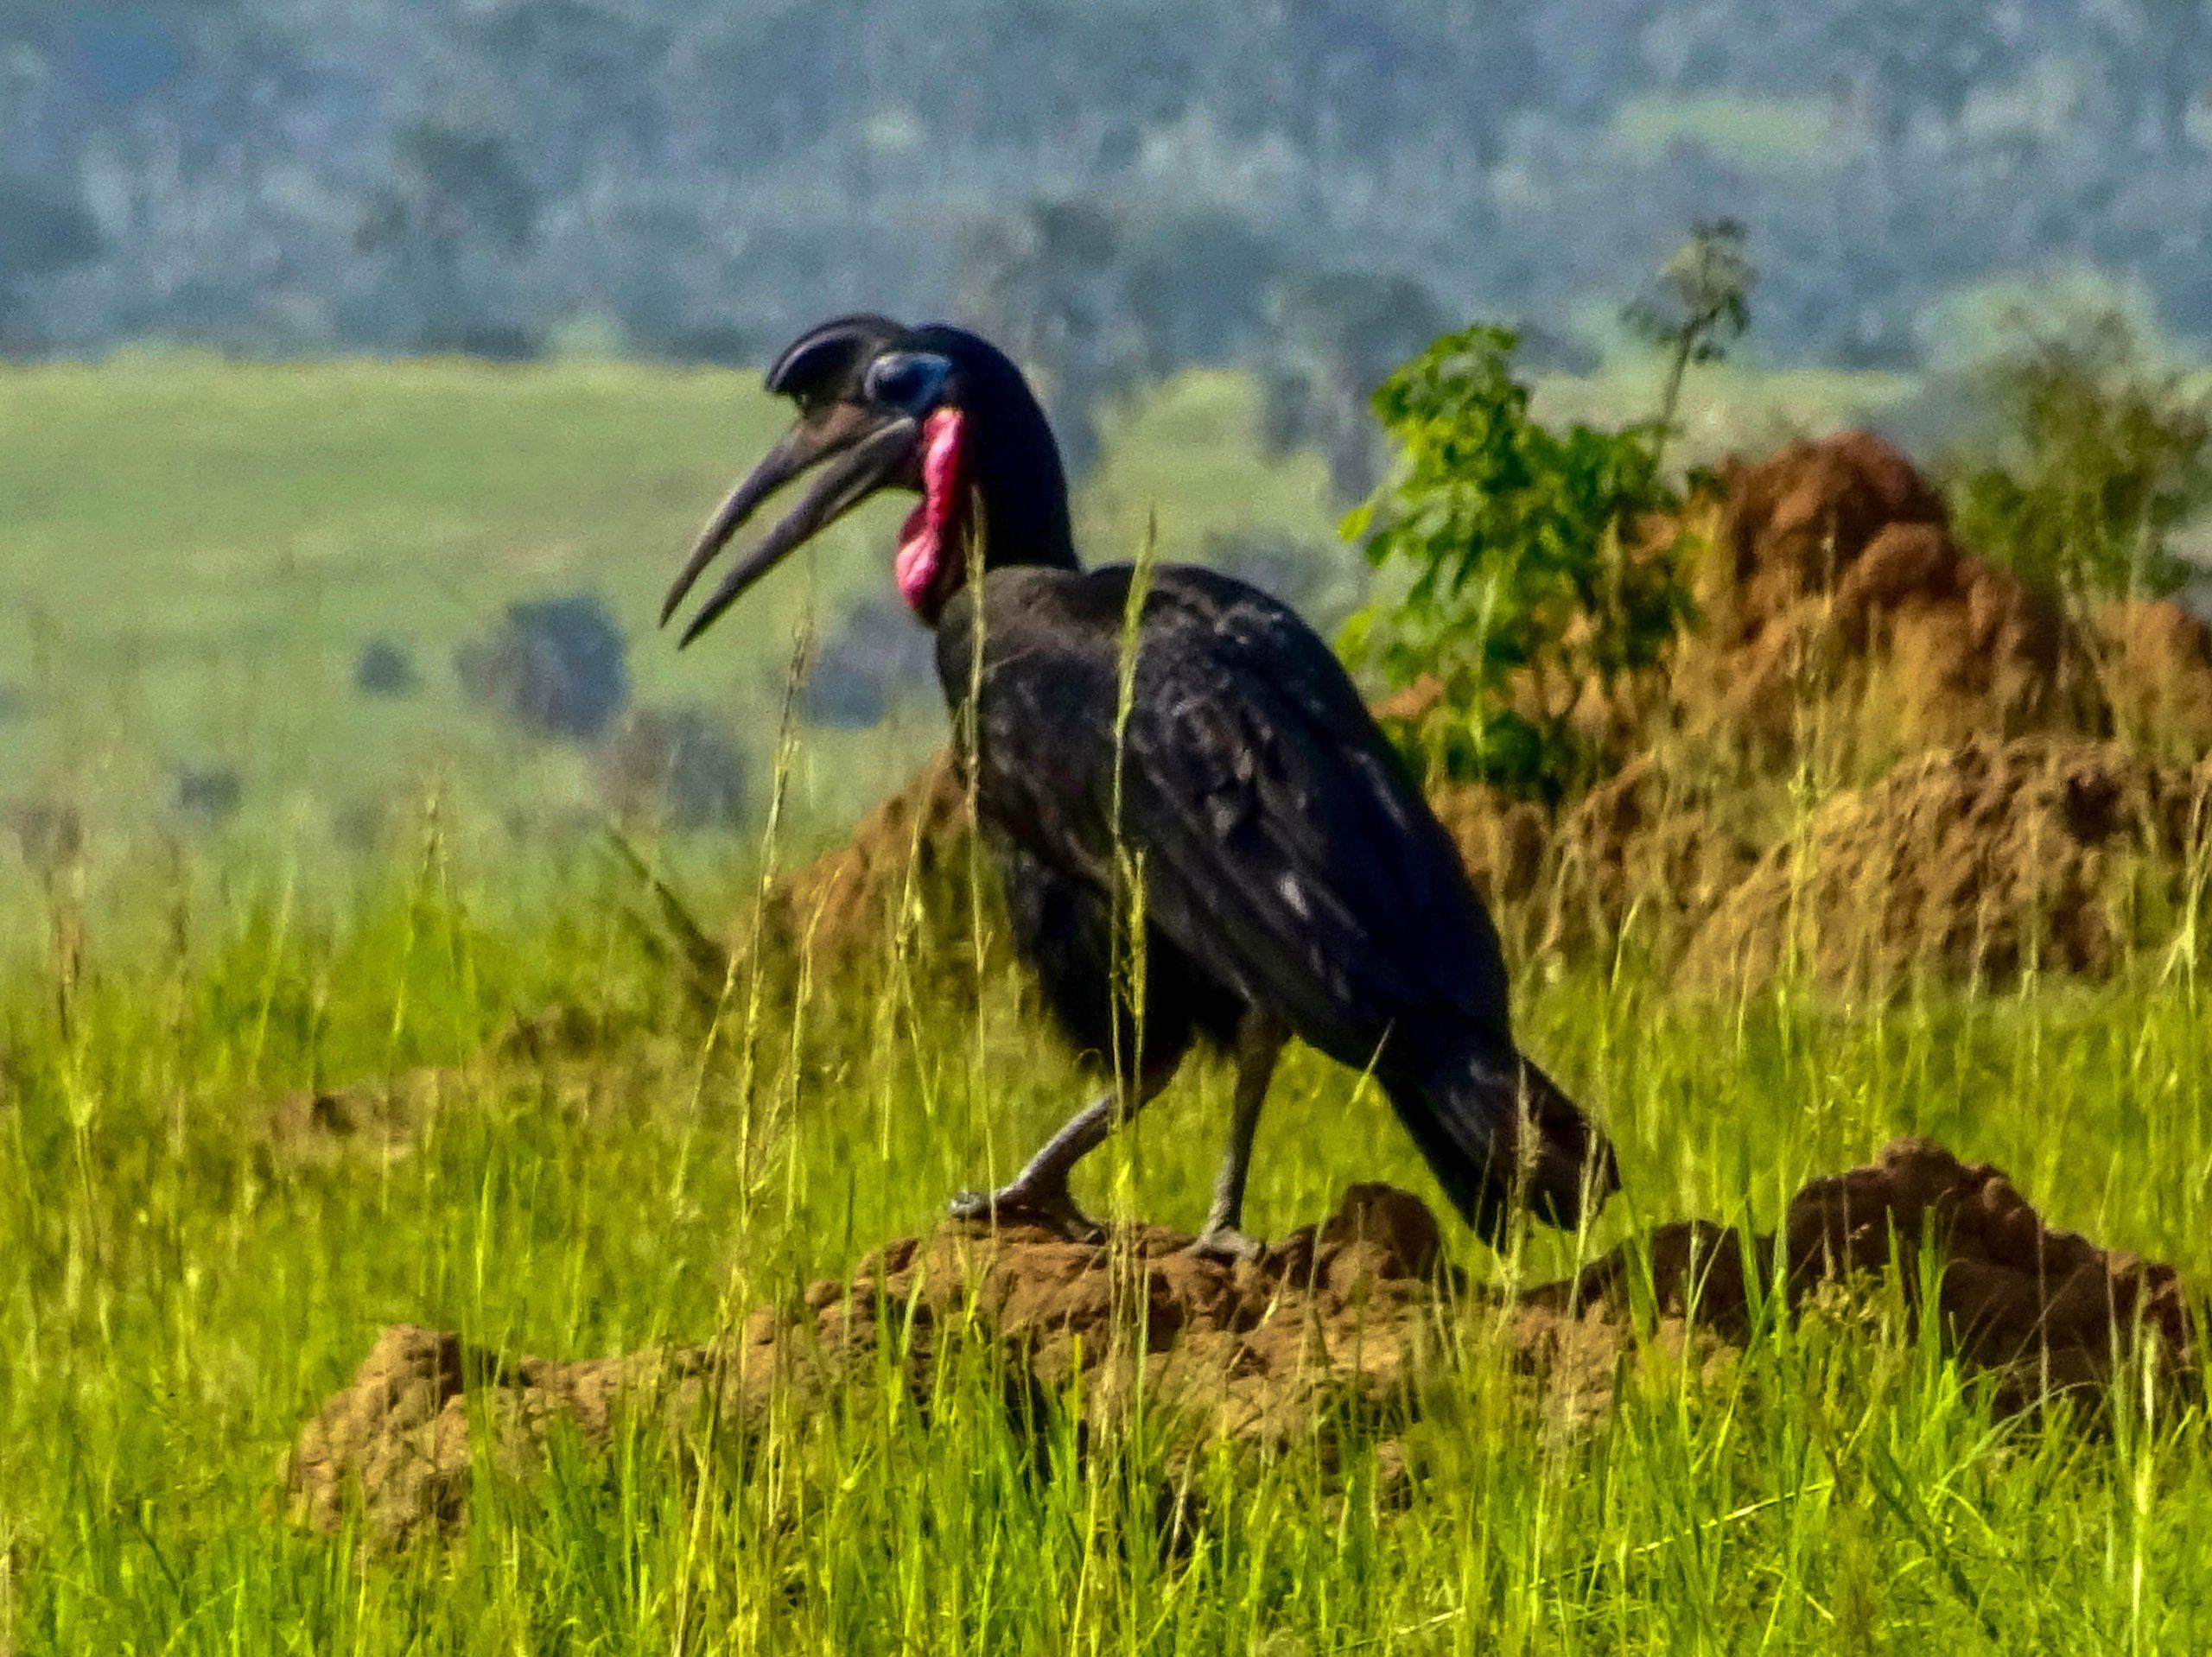 Een bromvogel (Southern Grounded Hornbill) in Murchison Falls NP